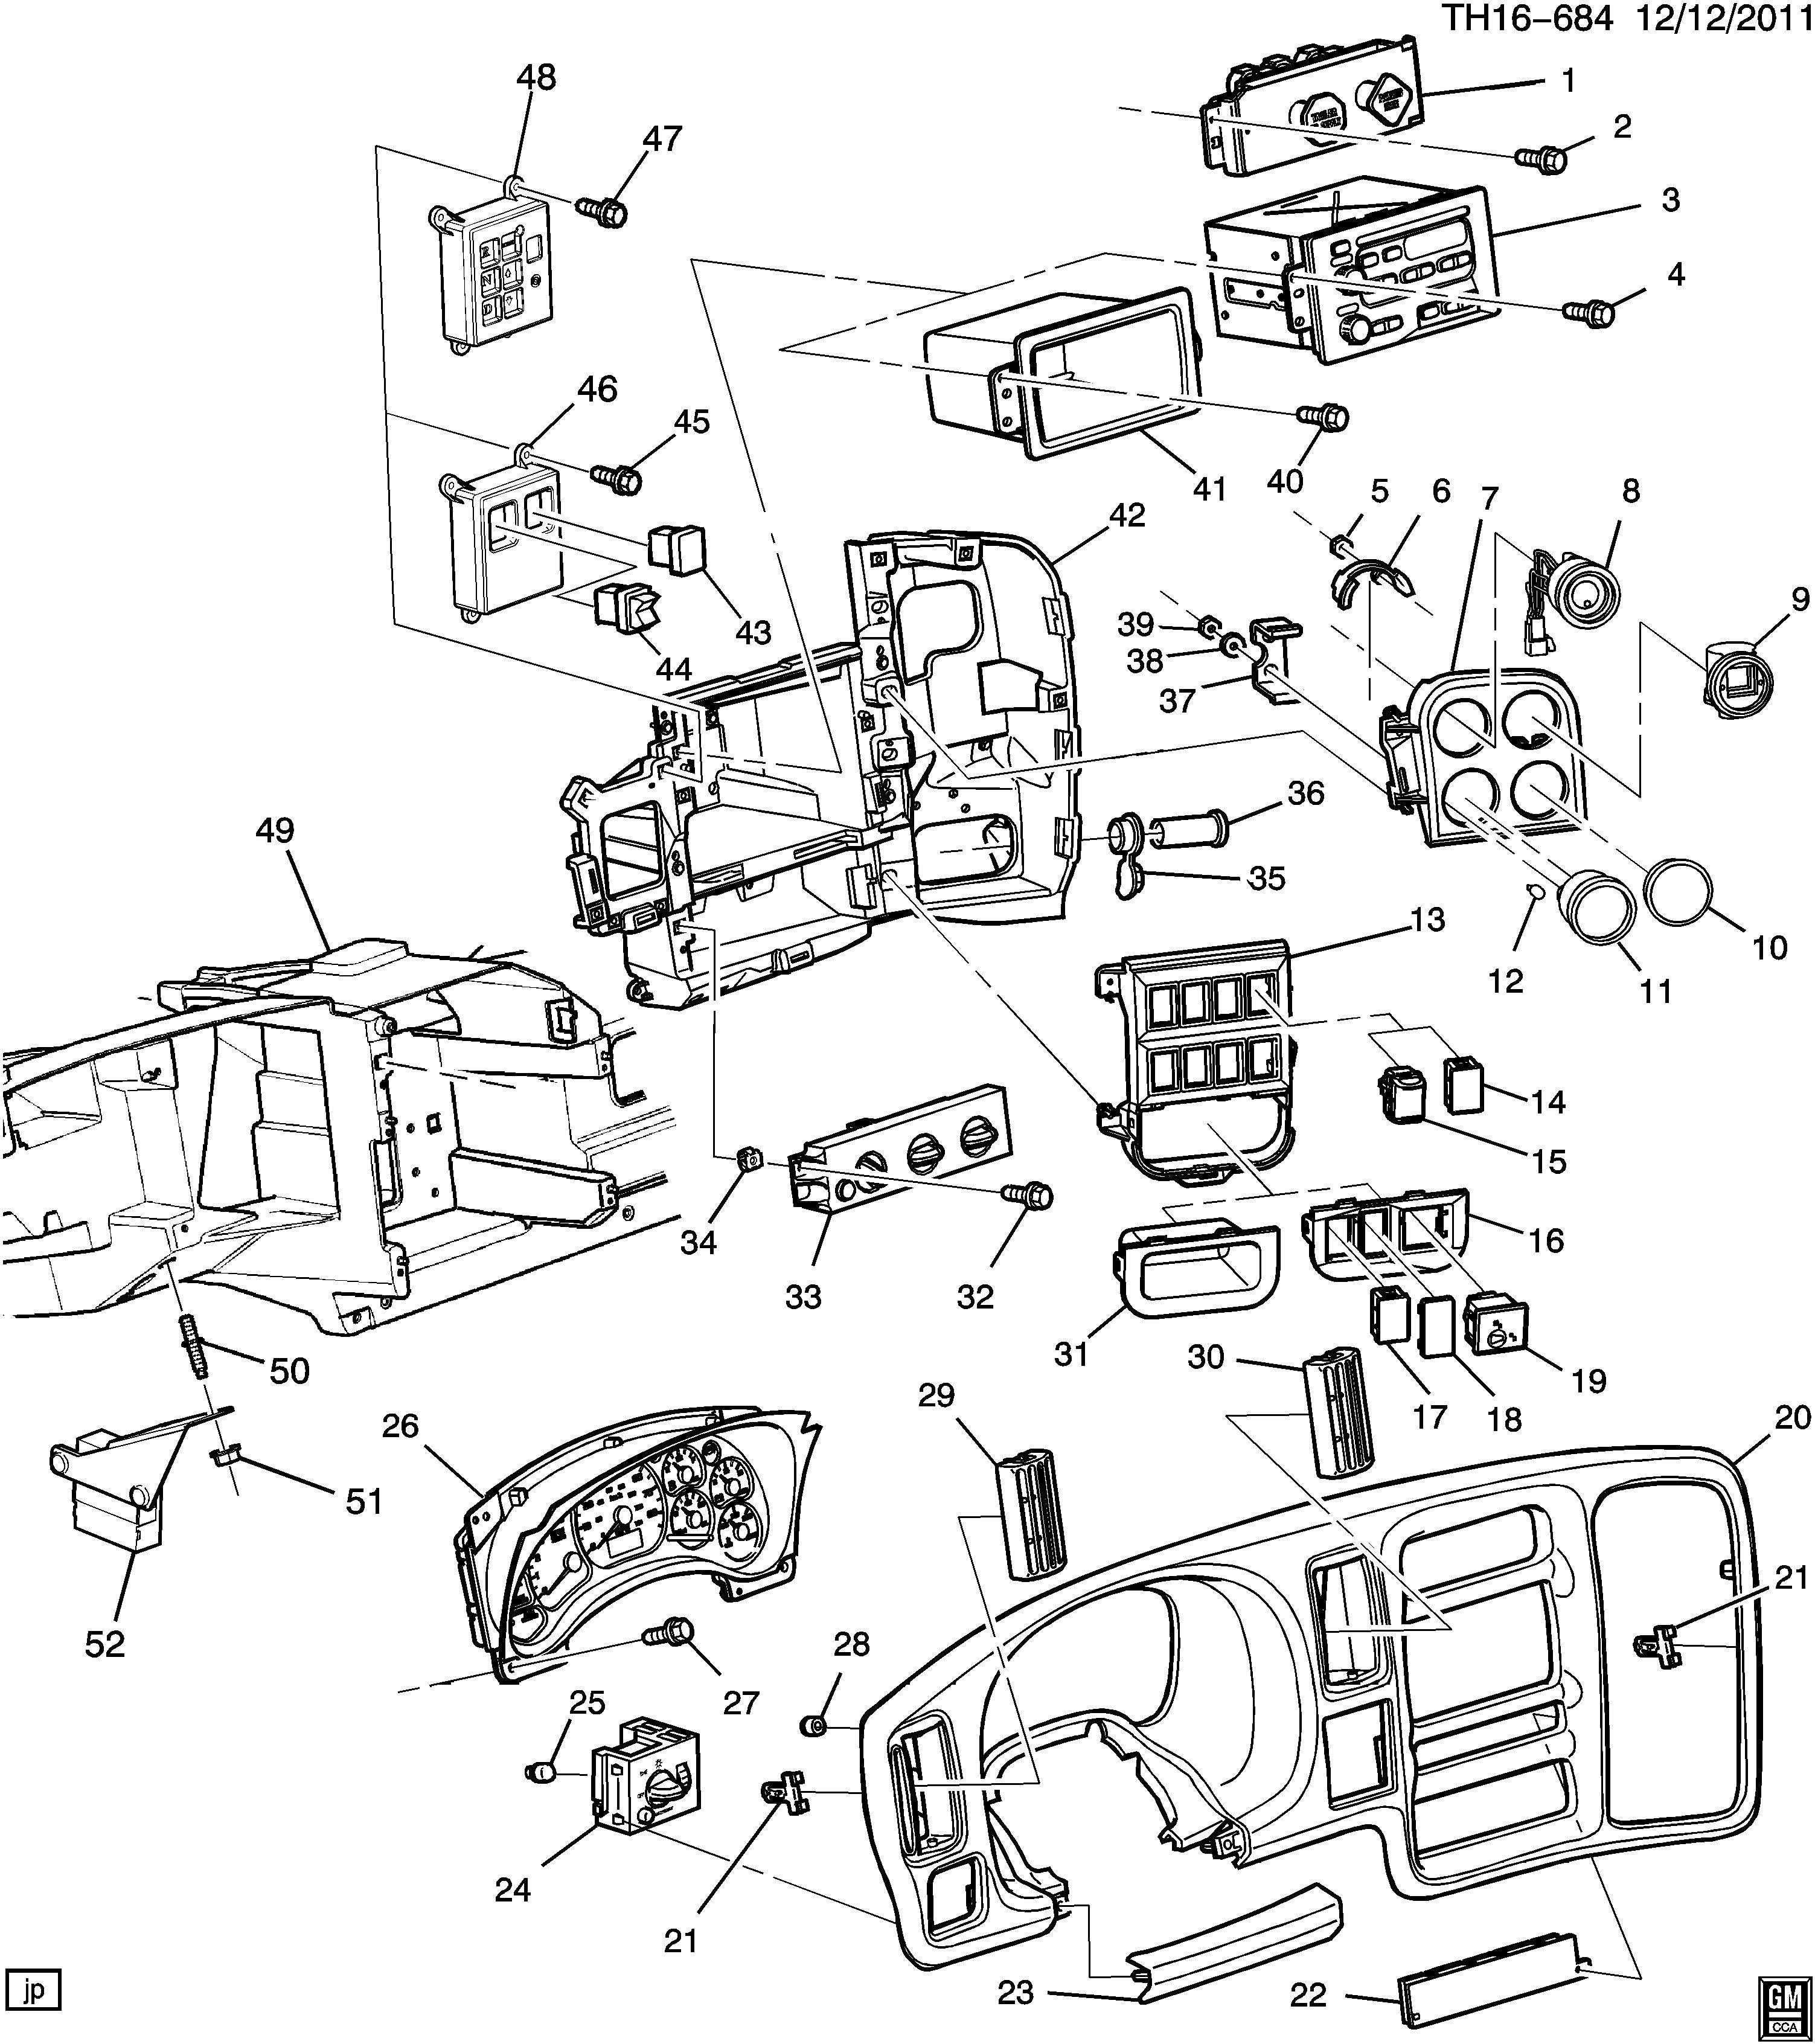 07 Chevy Kodiak Electronic Air Brake Manual Guide